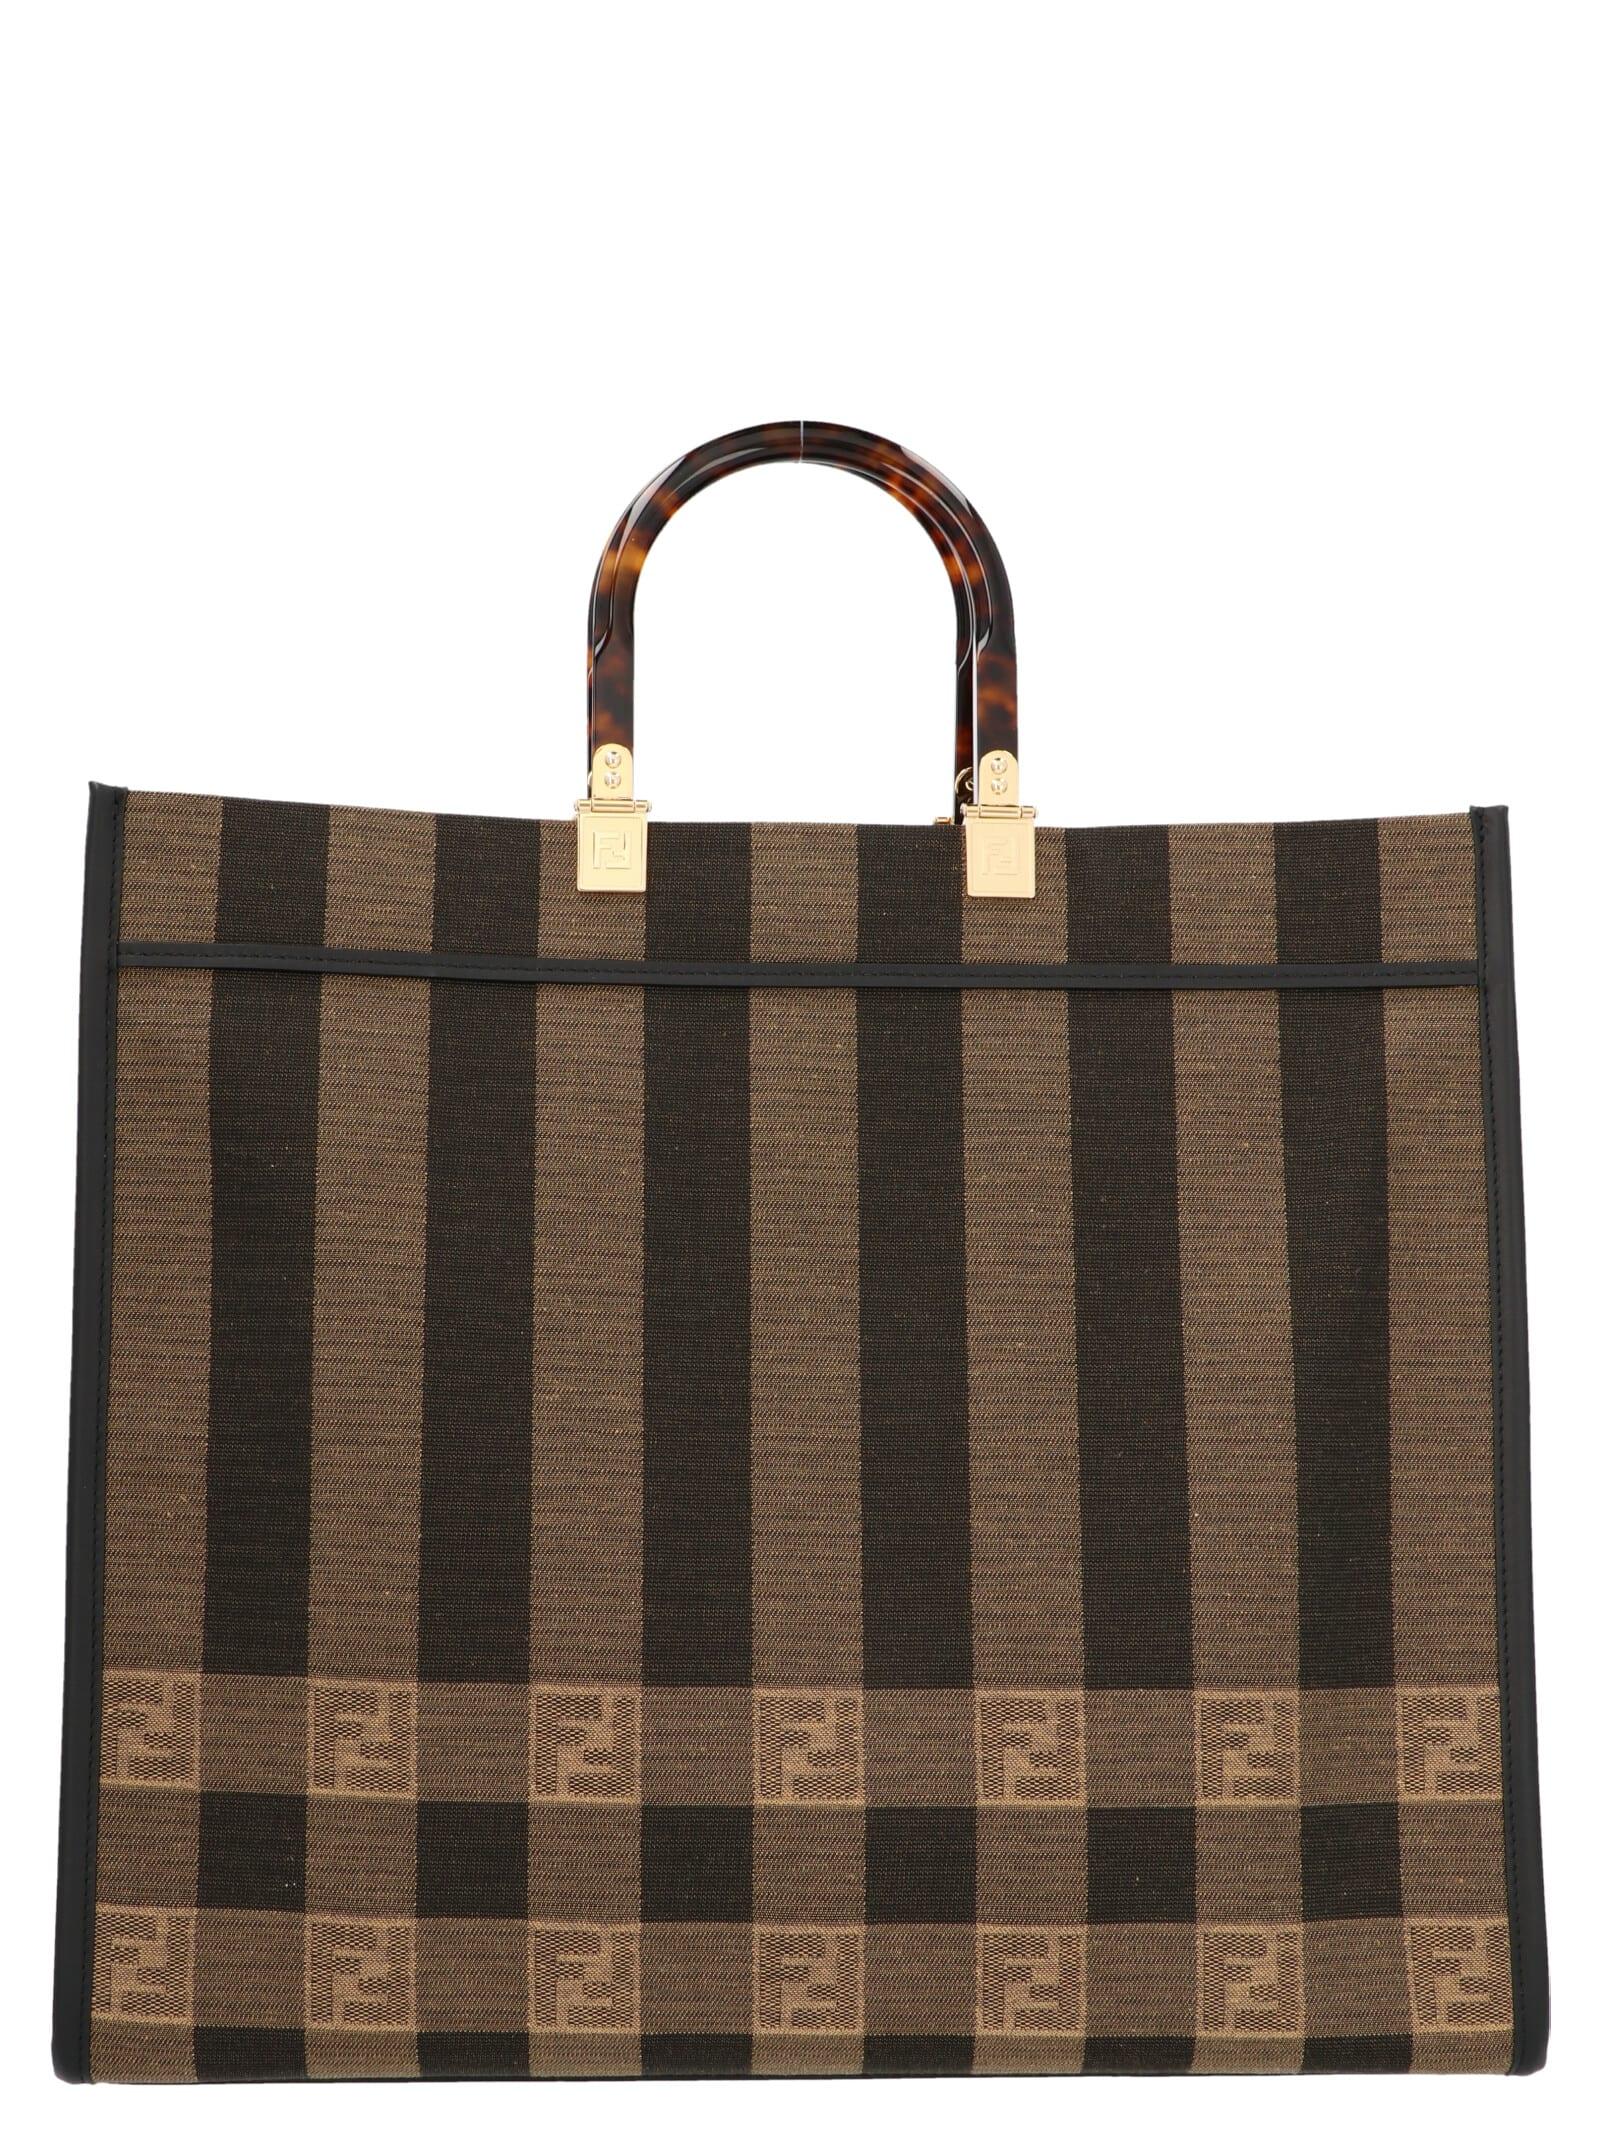 Fendi sunshine Bag